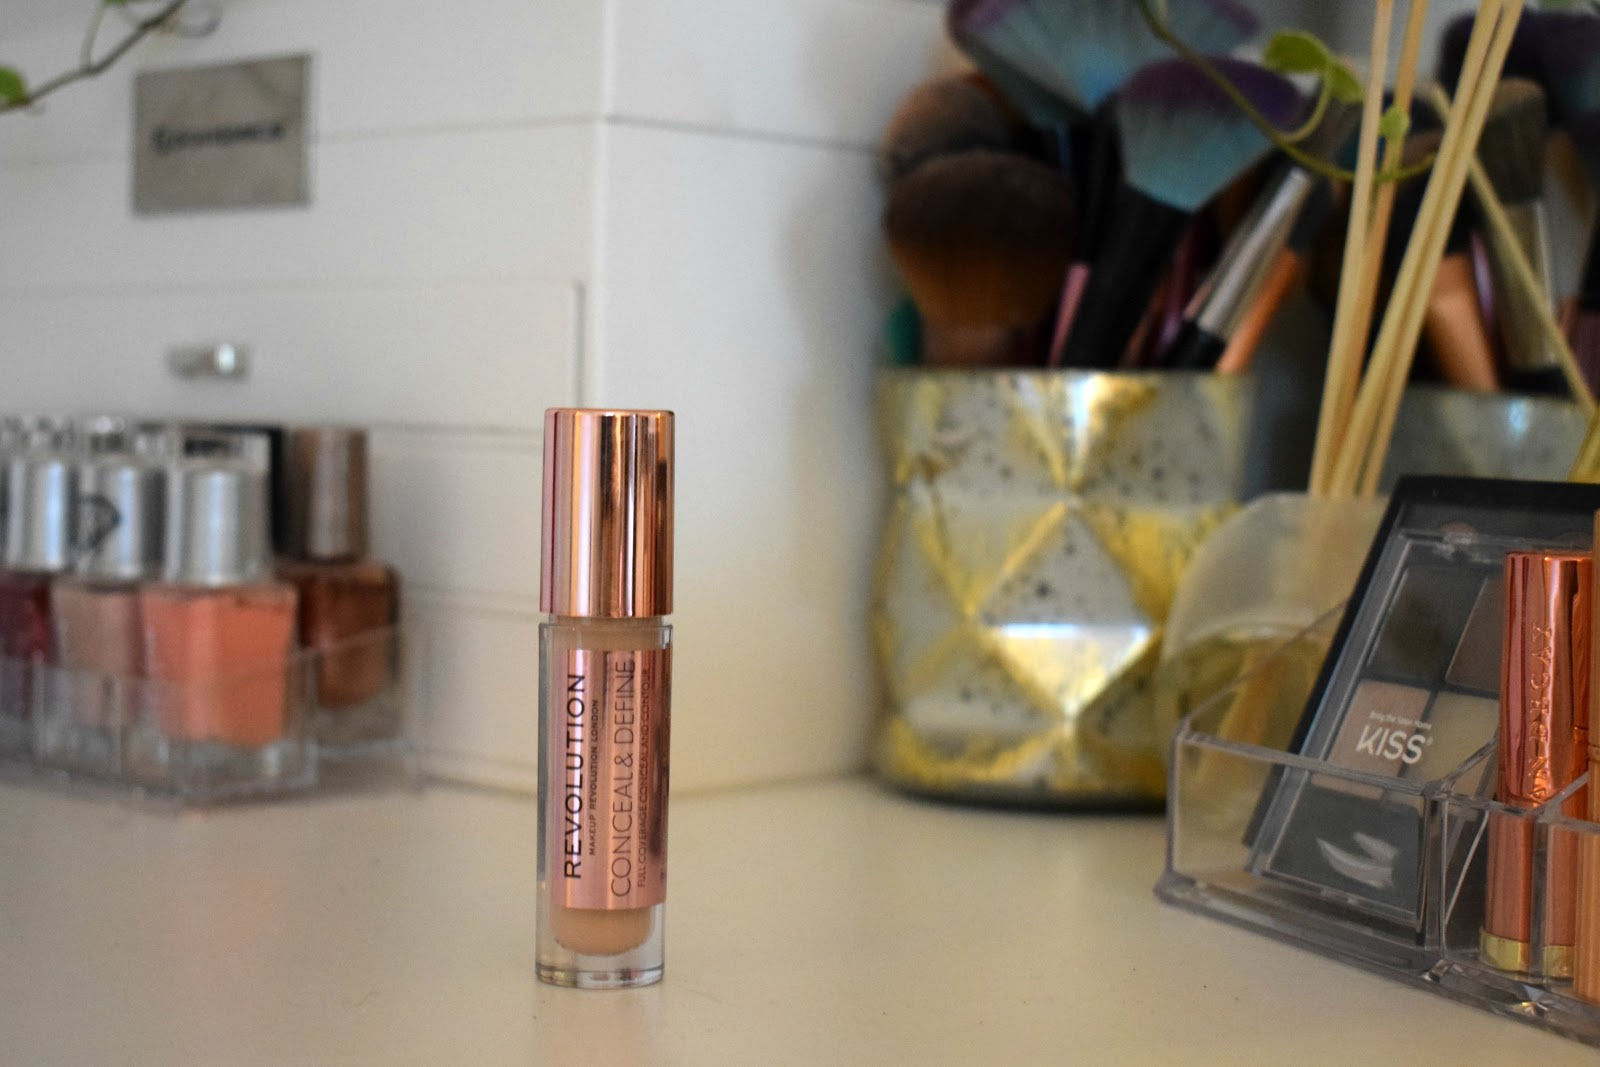 Makeup Revolution Conceal & Define review